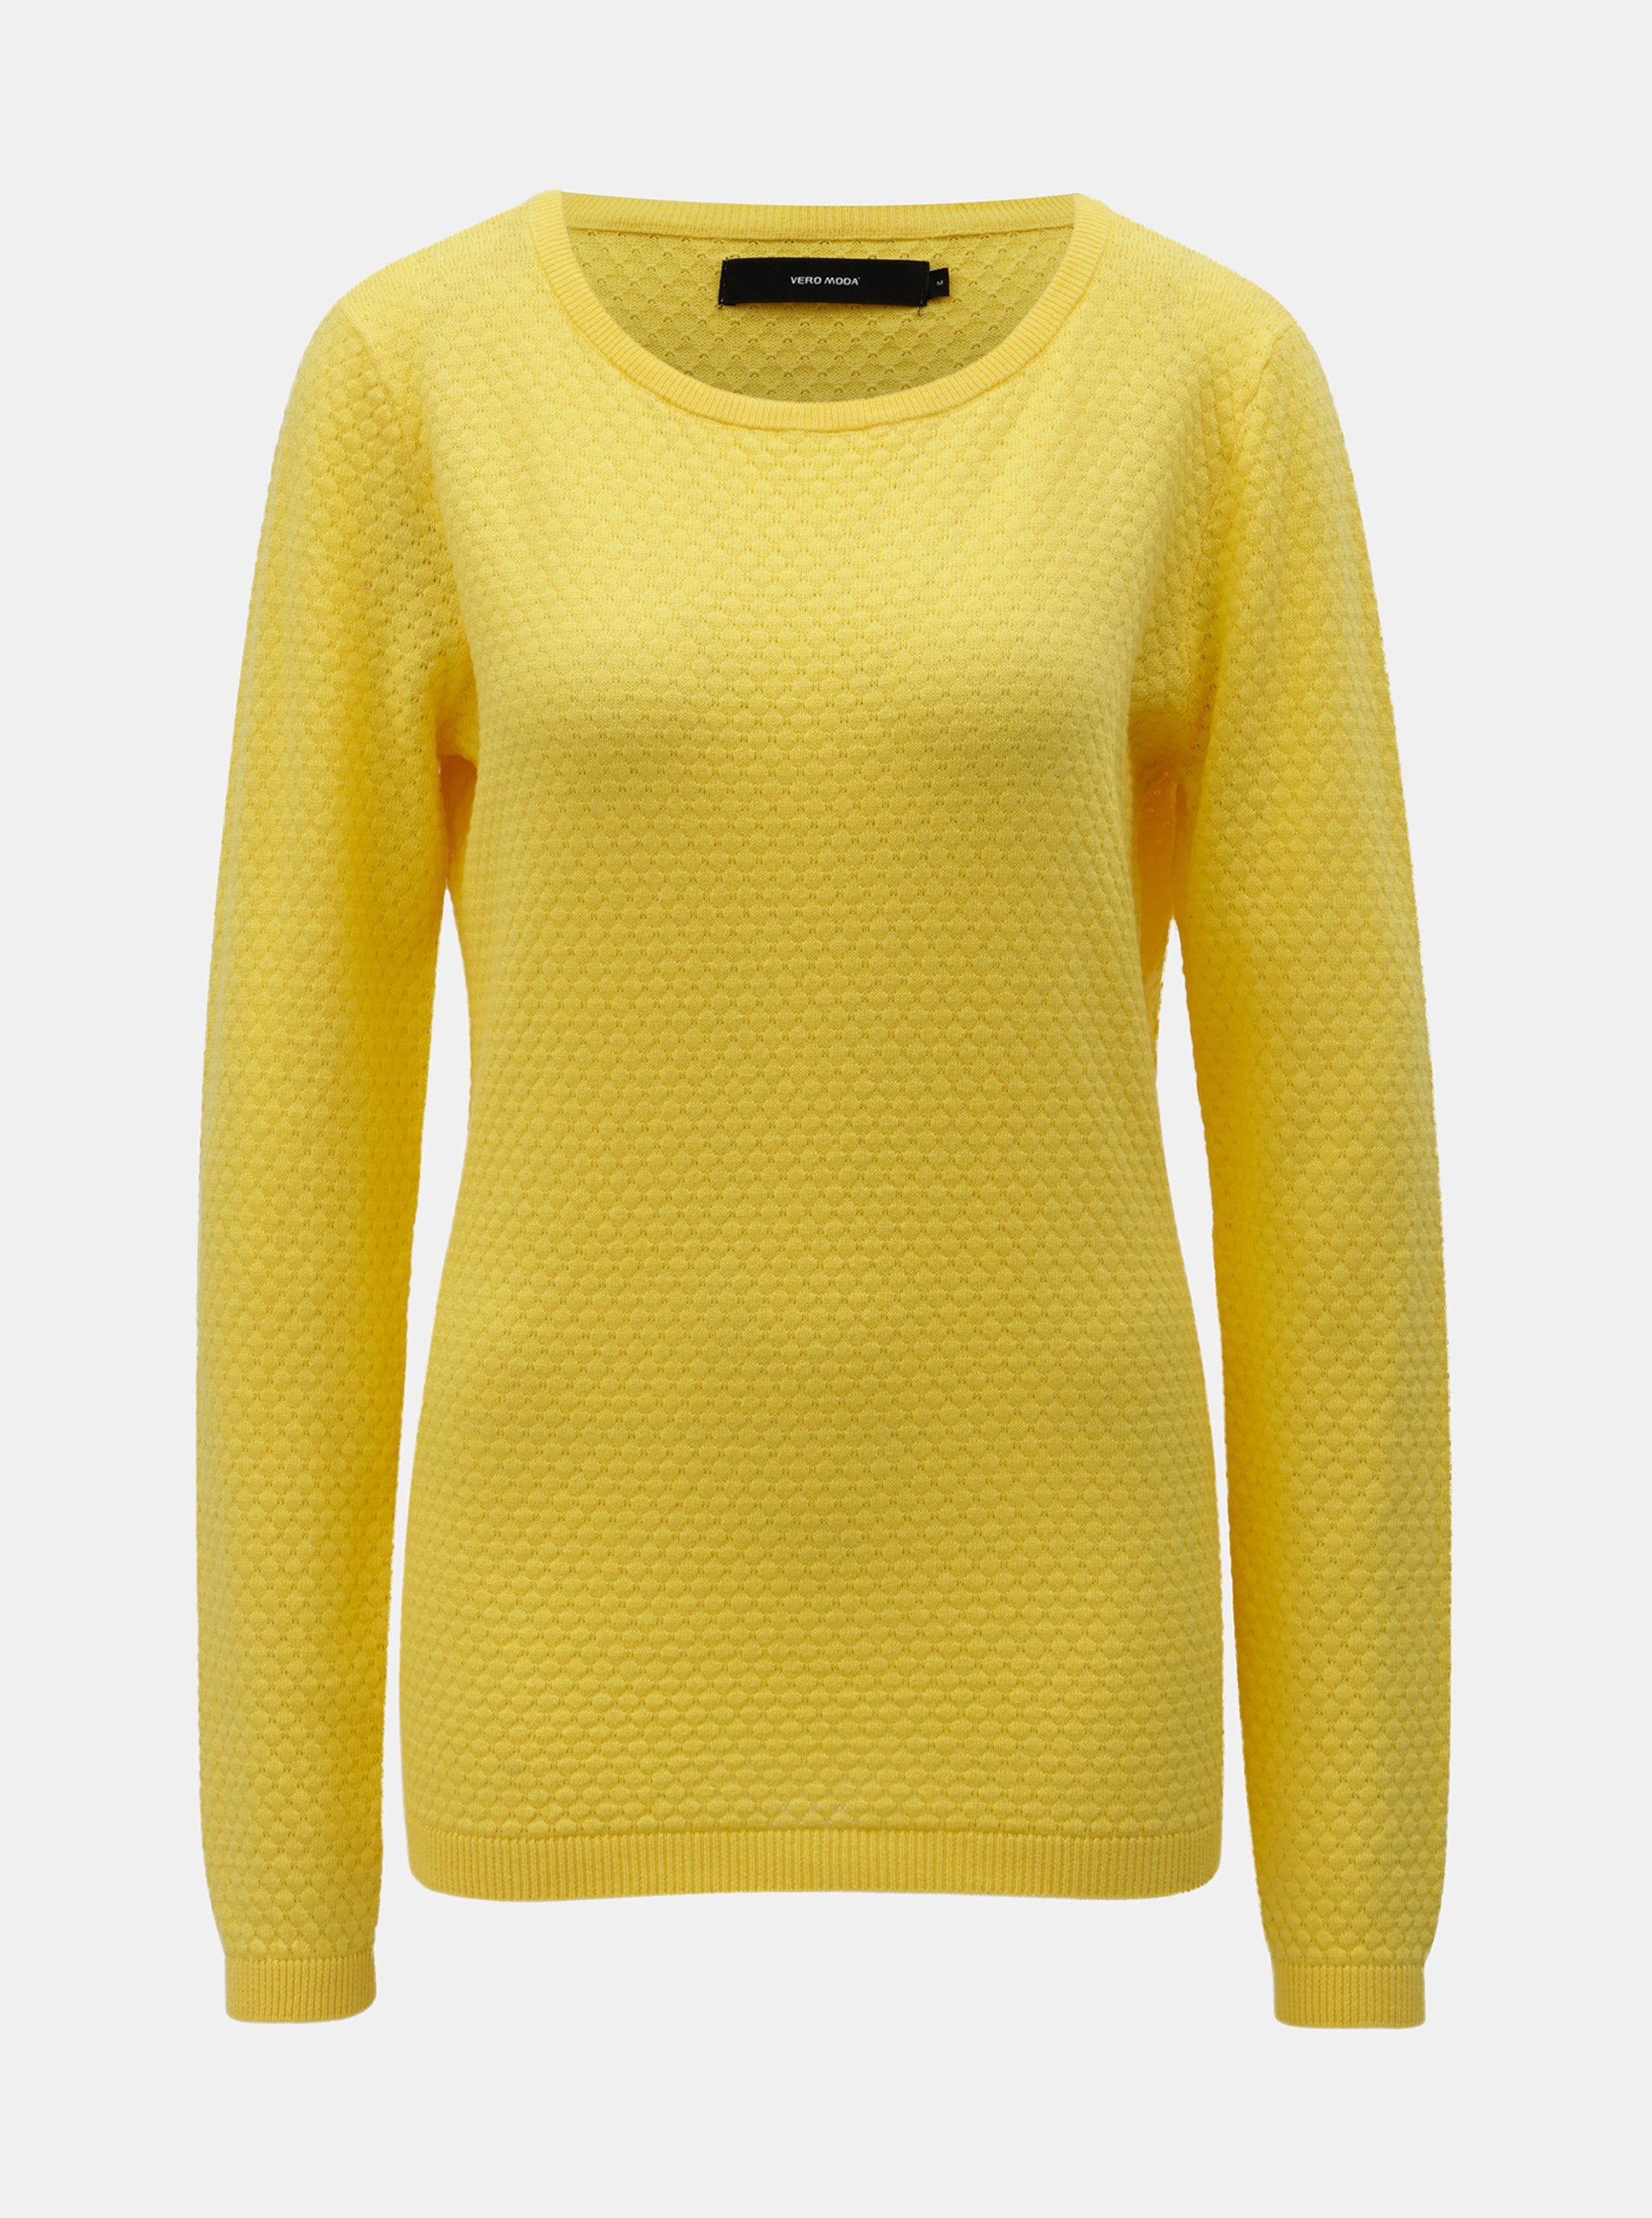 Žlutý svetr VERO MODA Care ... fad401c1e5